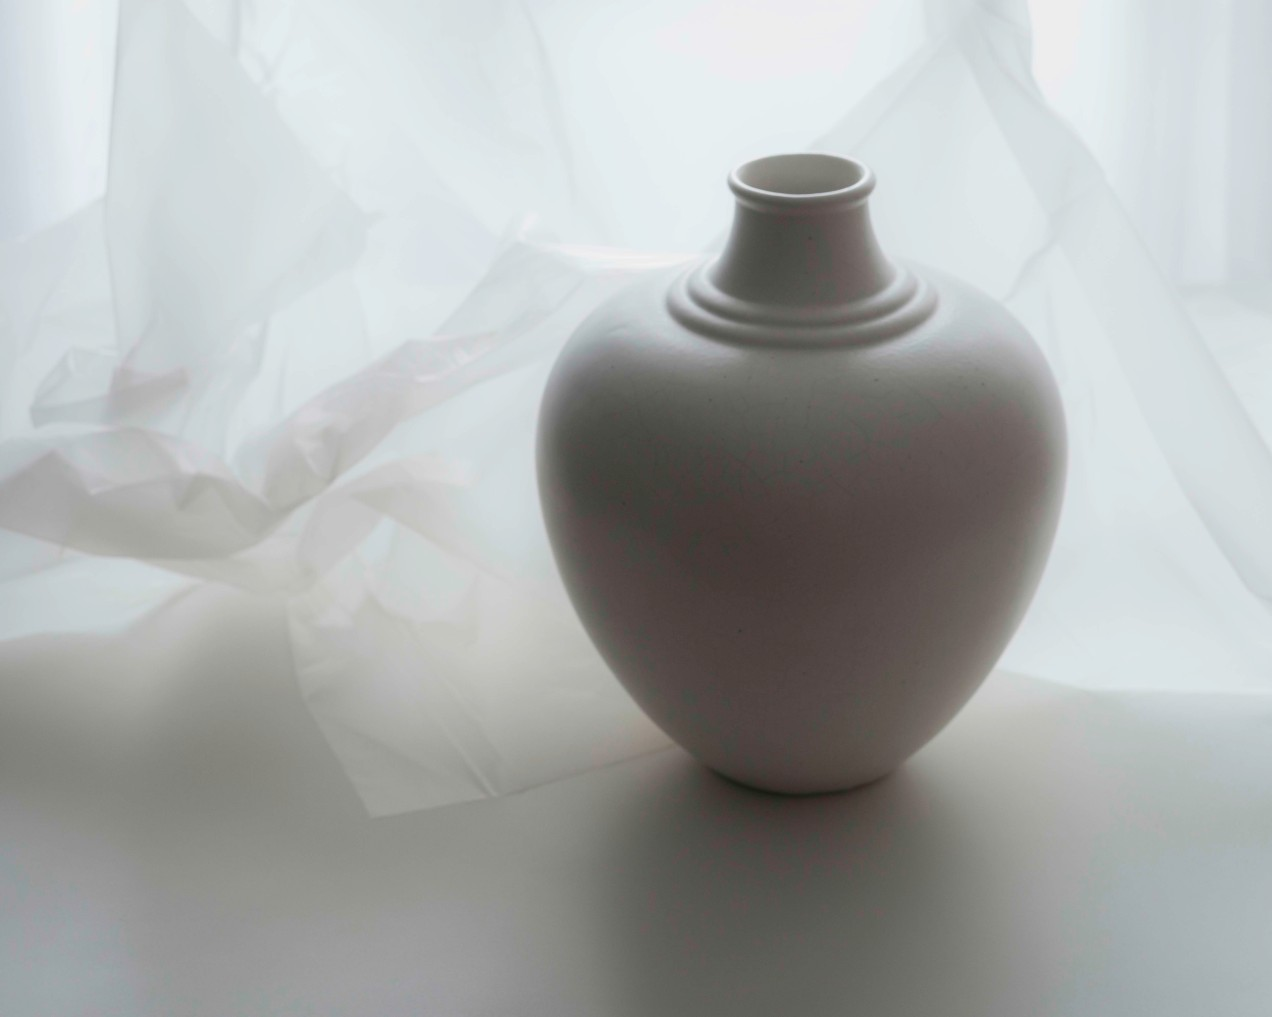 Nature morte, vase 1930 blanc, gildalliere, Paris, 2020